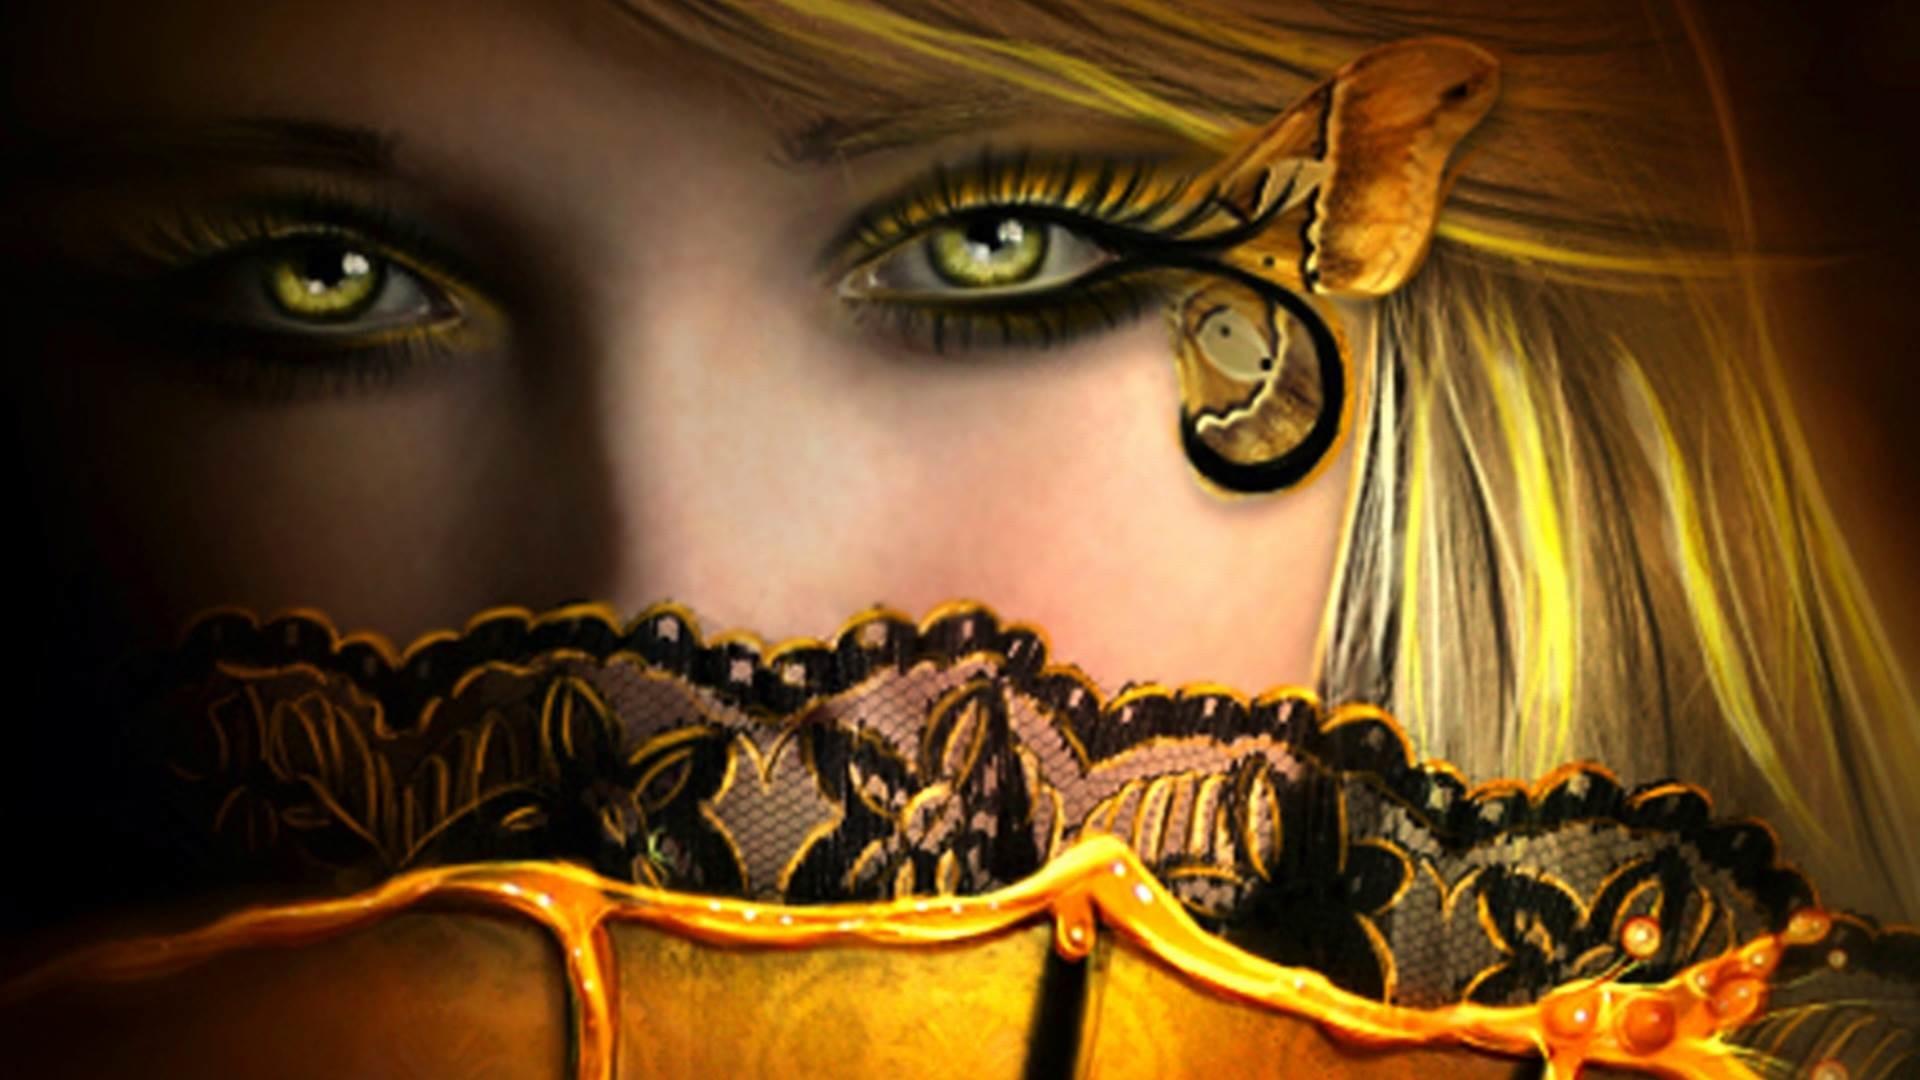 Beautiful Fairies Wallpapers Wallpaper 800ã—600 Beautiful - Fantasy Woman In Yellow - HD Wallpaper